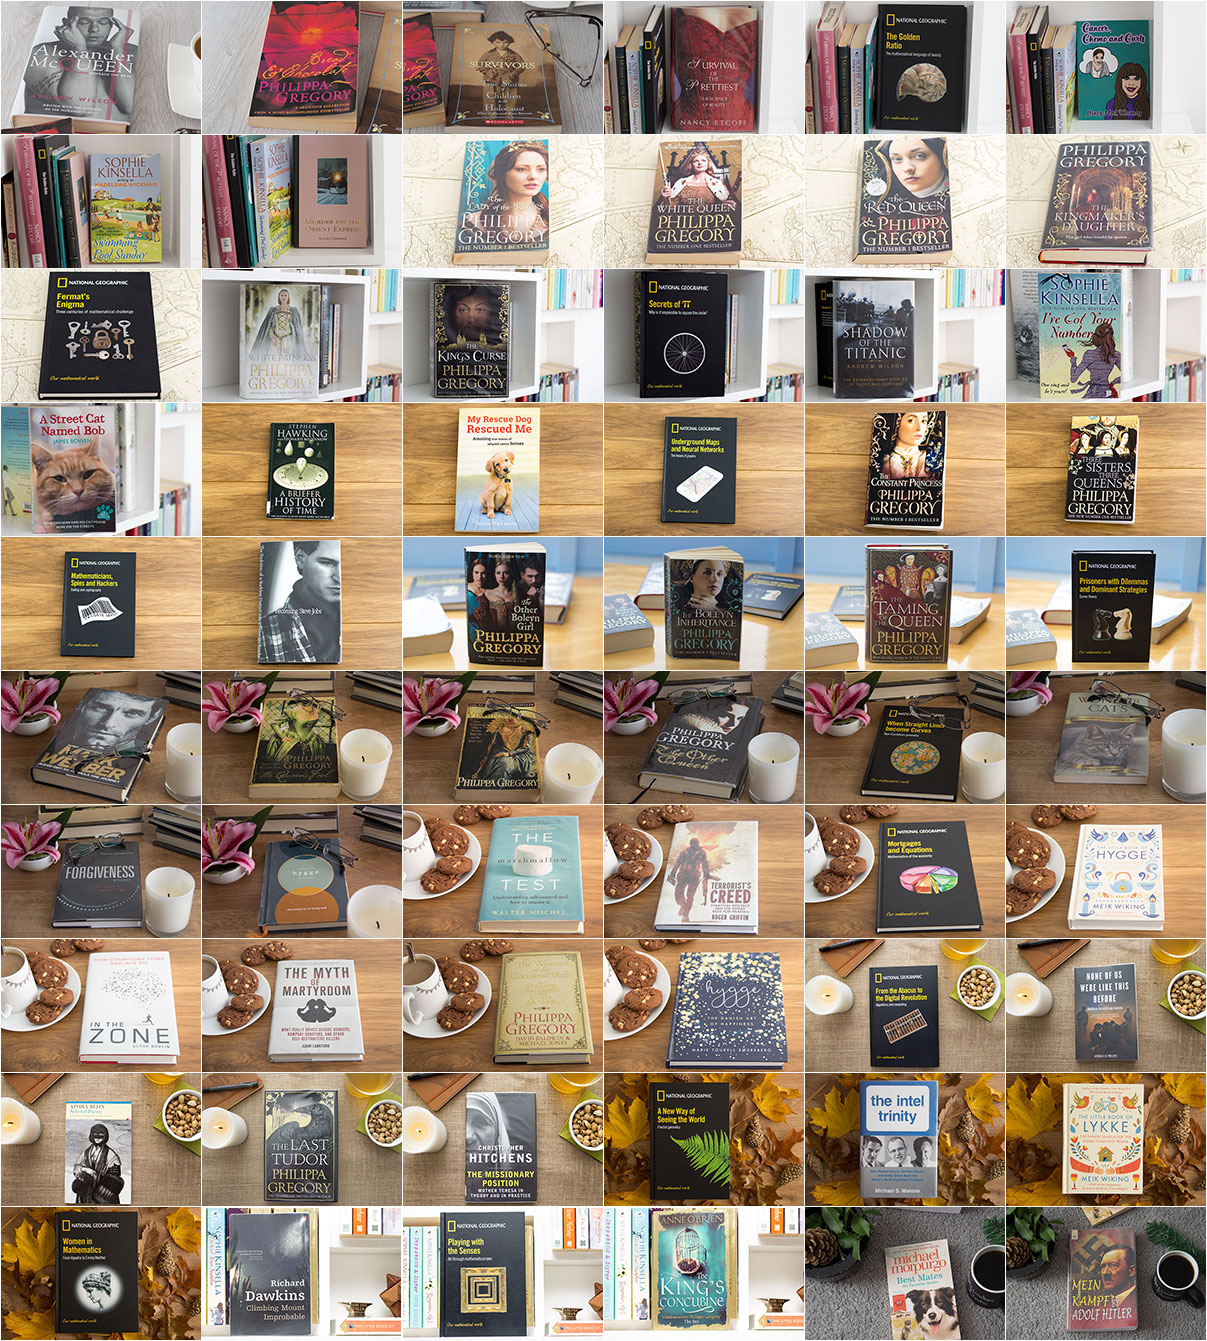 60 Books collage